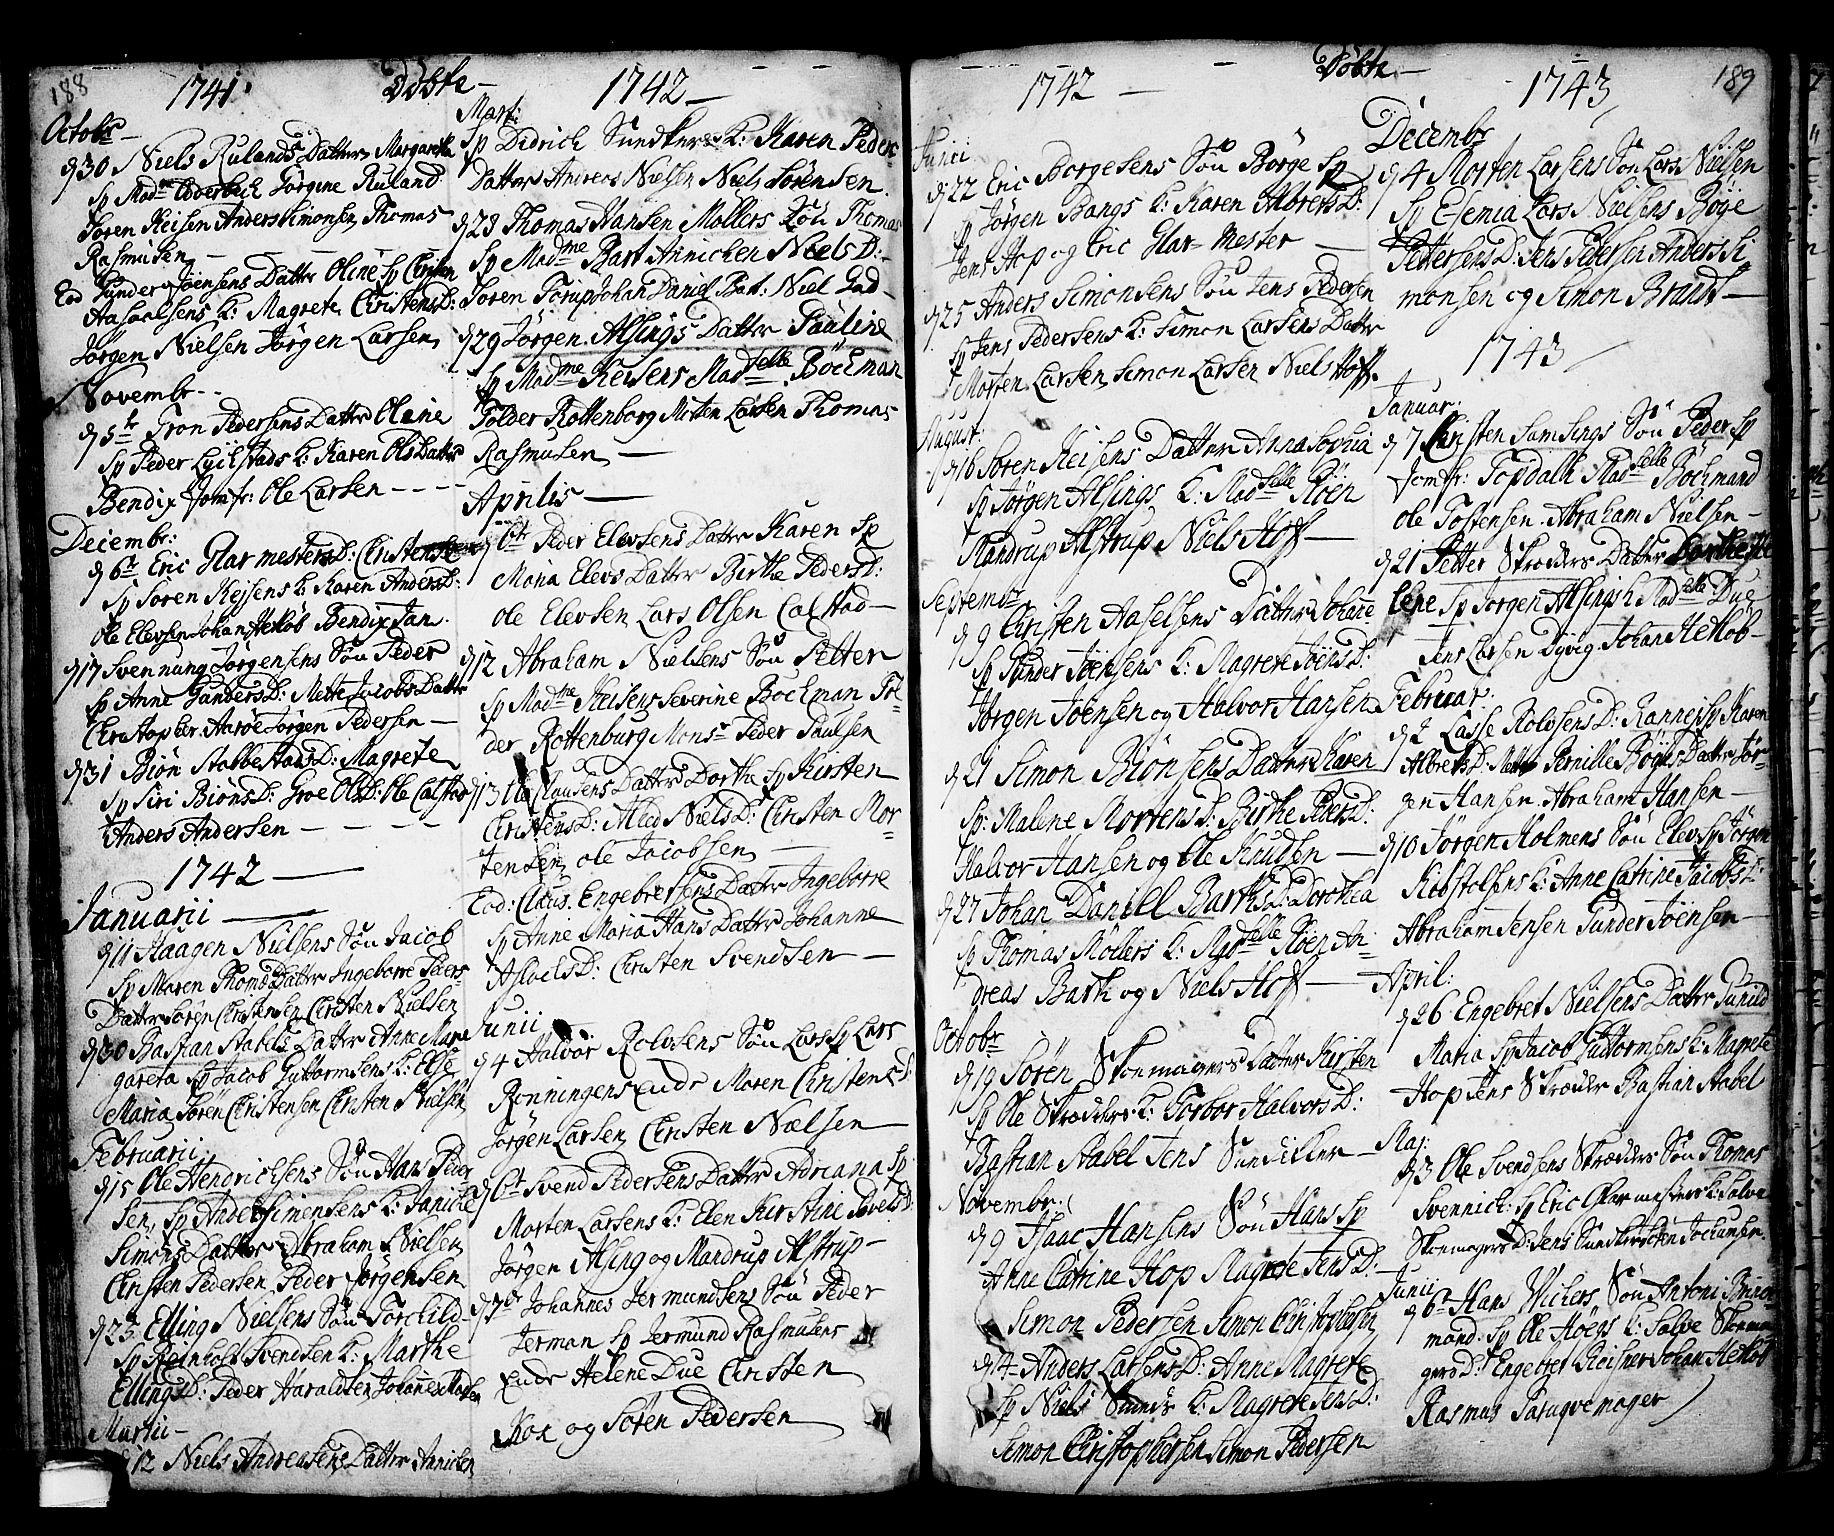 SAKO, Kragerø kirkebøker, F/Fa/L0001: Ministerialbok nr. 1, 1702-1766, s. 188-189